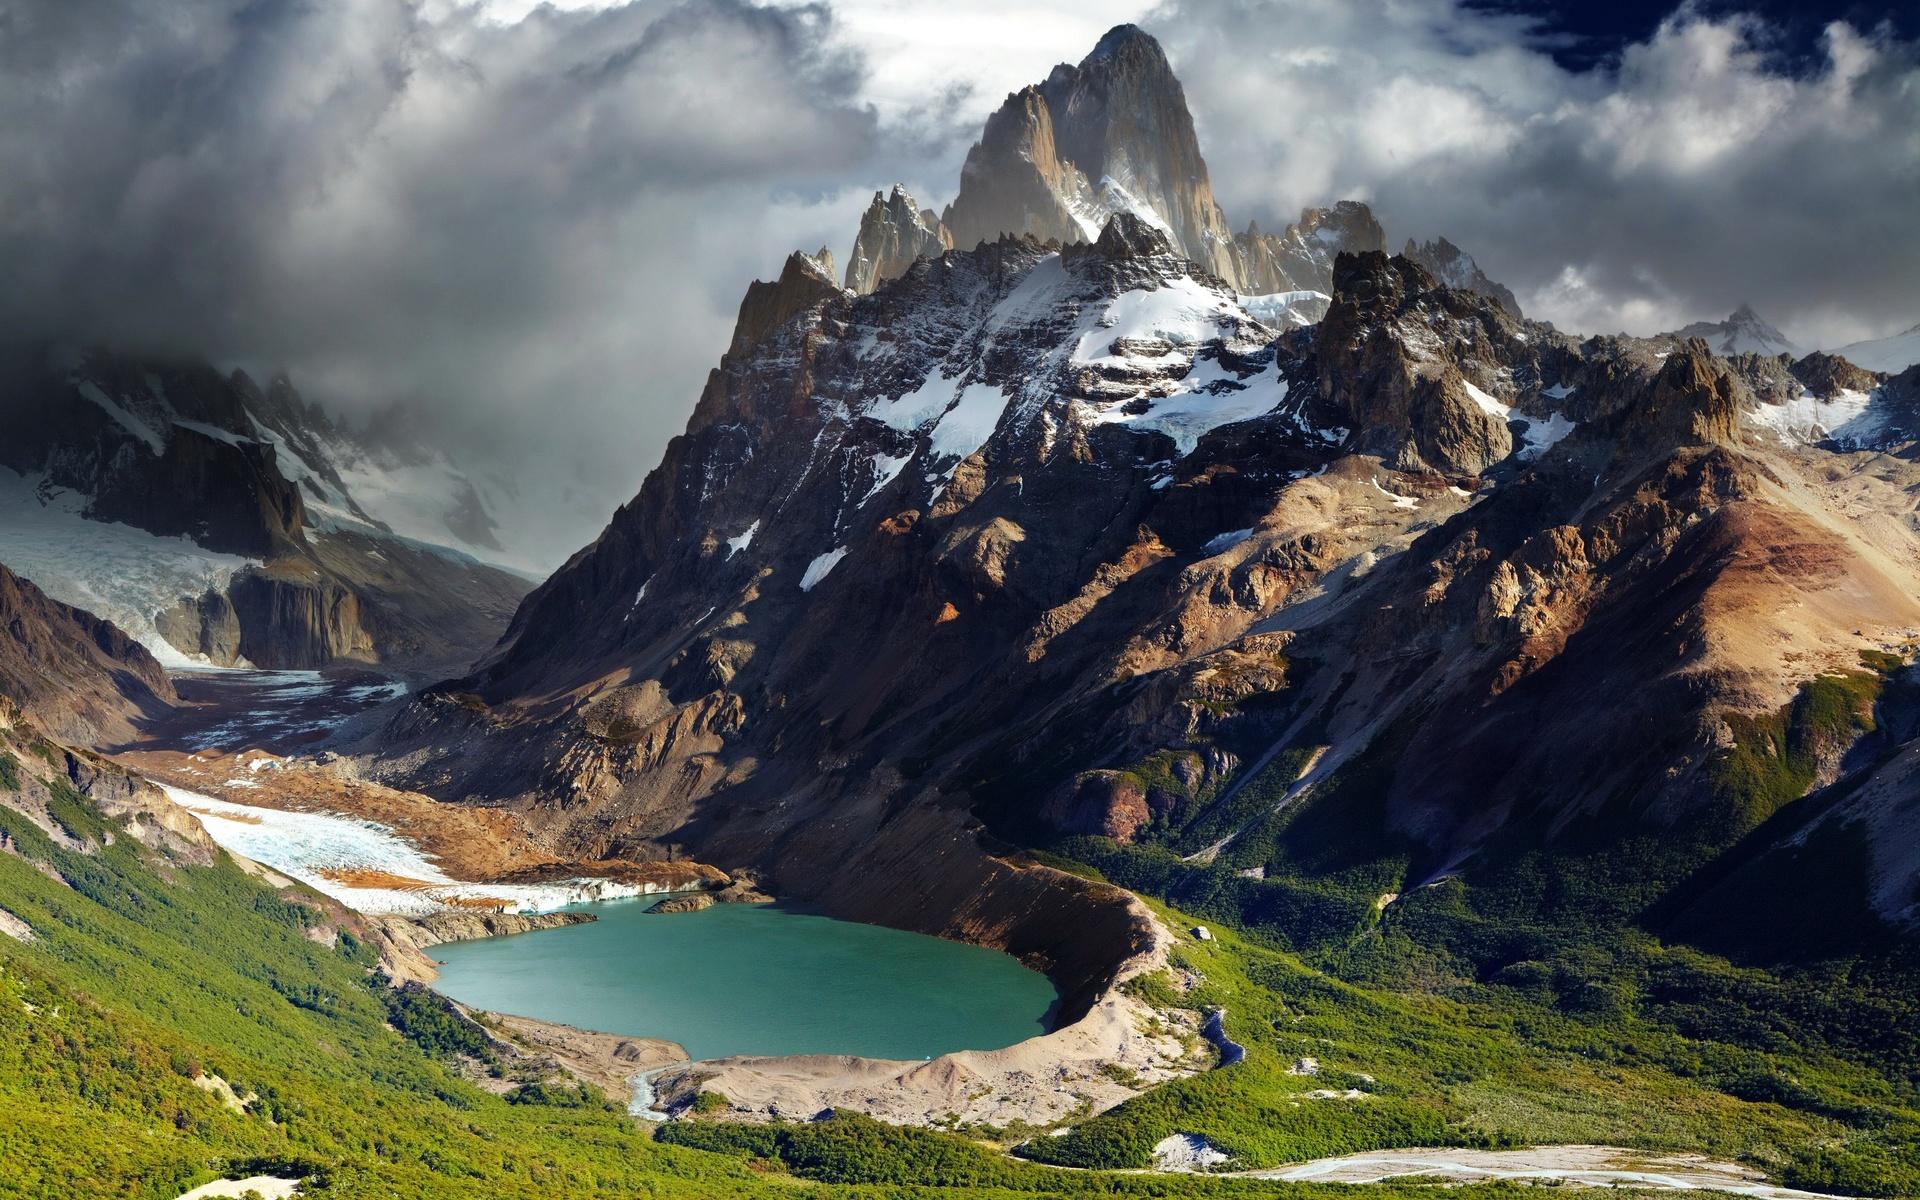 national park, patagonia, chile, горы, снег, облака, озеро, зелень, природа, пейзаж